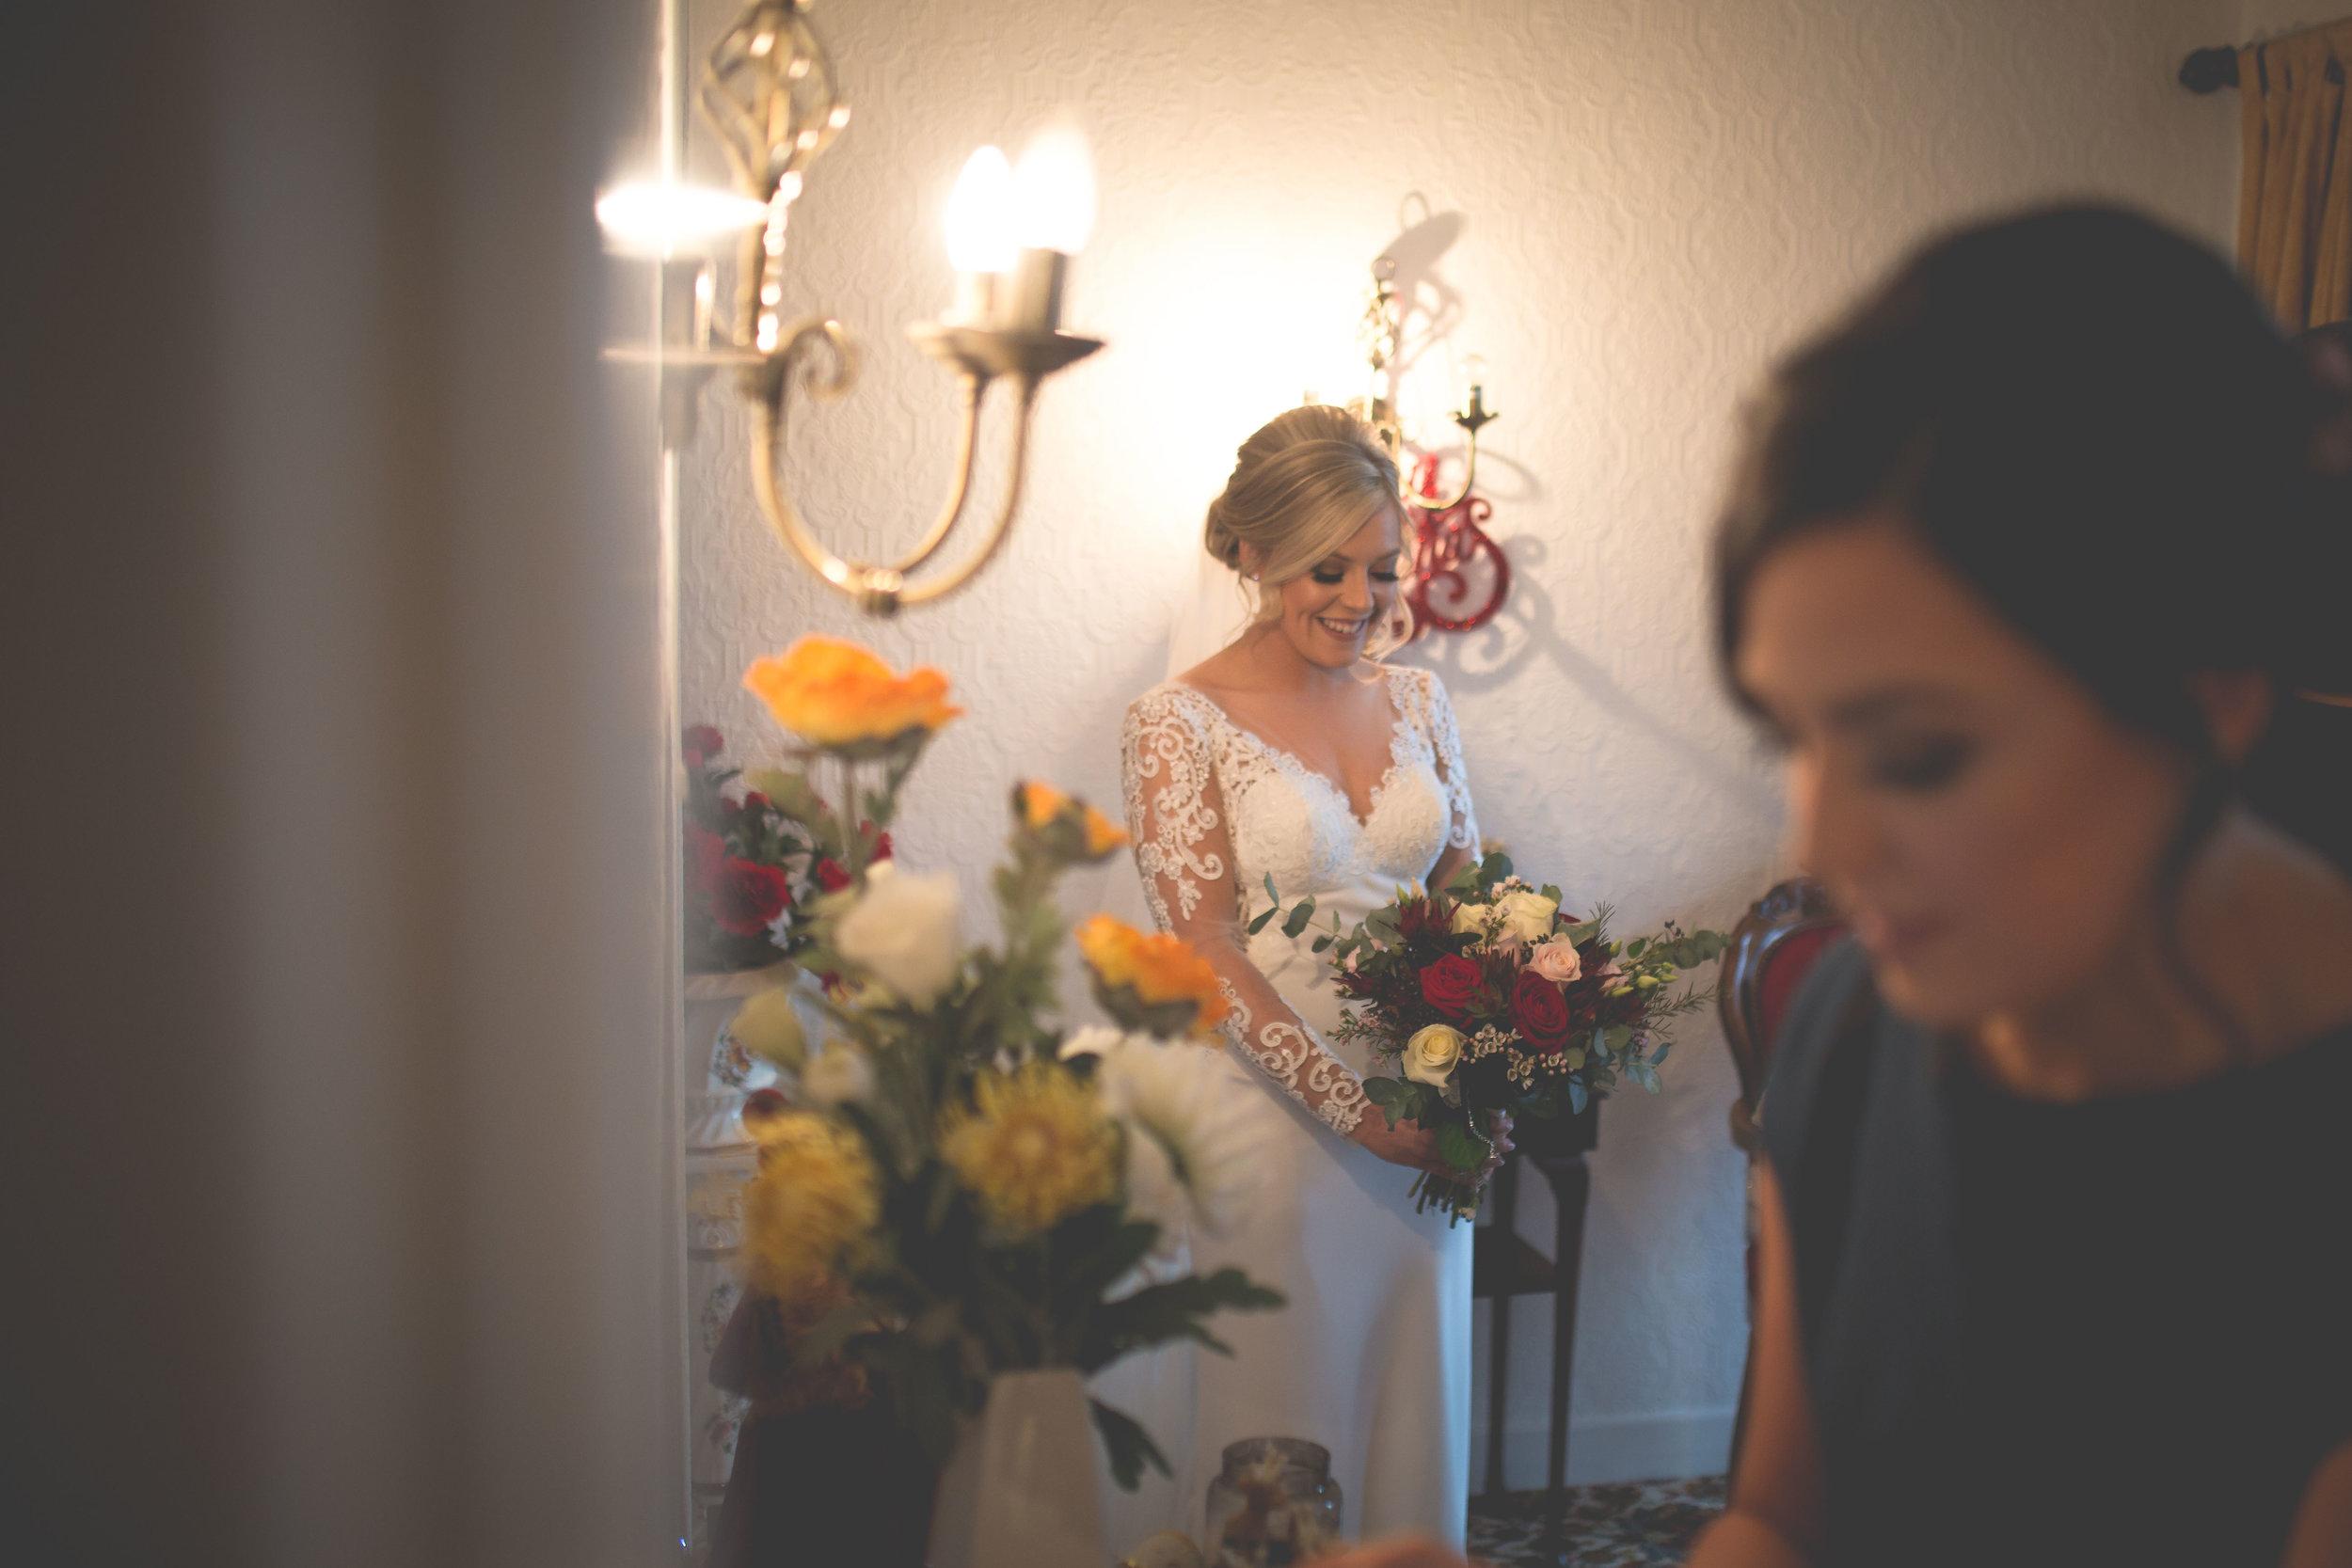 Northern Ireland Wedding Photographer   Brian McEwan Photography   Affordable Wedding Photography Throughout Antrim Down Armagh Tyrone Londonderry Derry Down Fermanagh -72.jpg